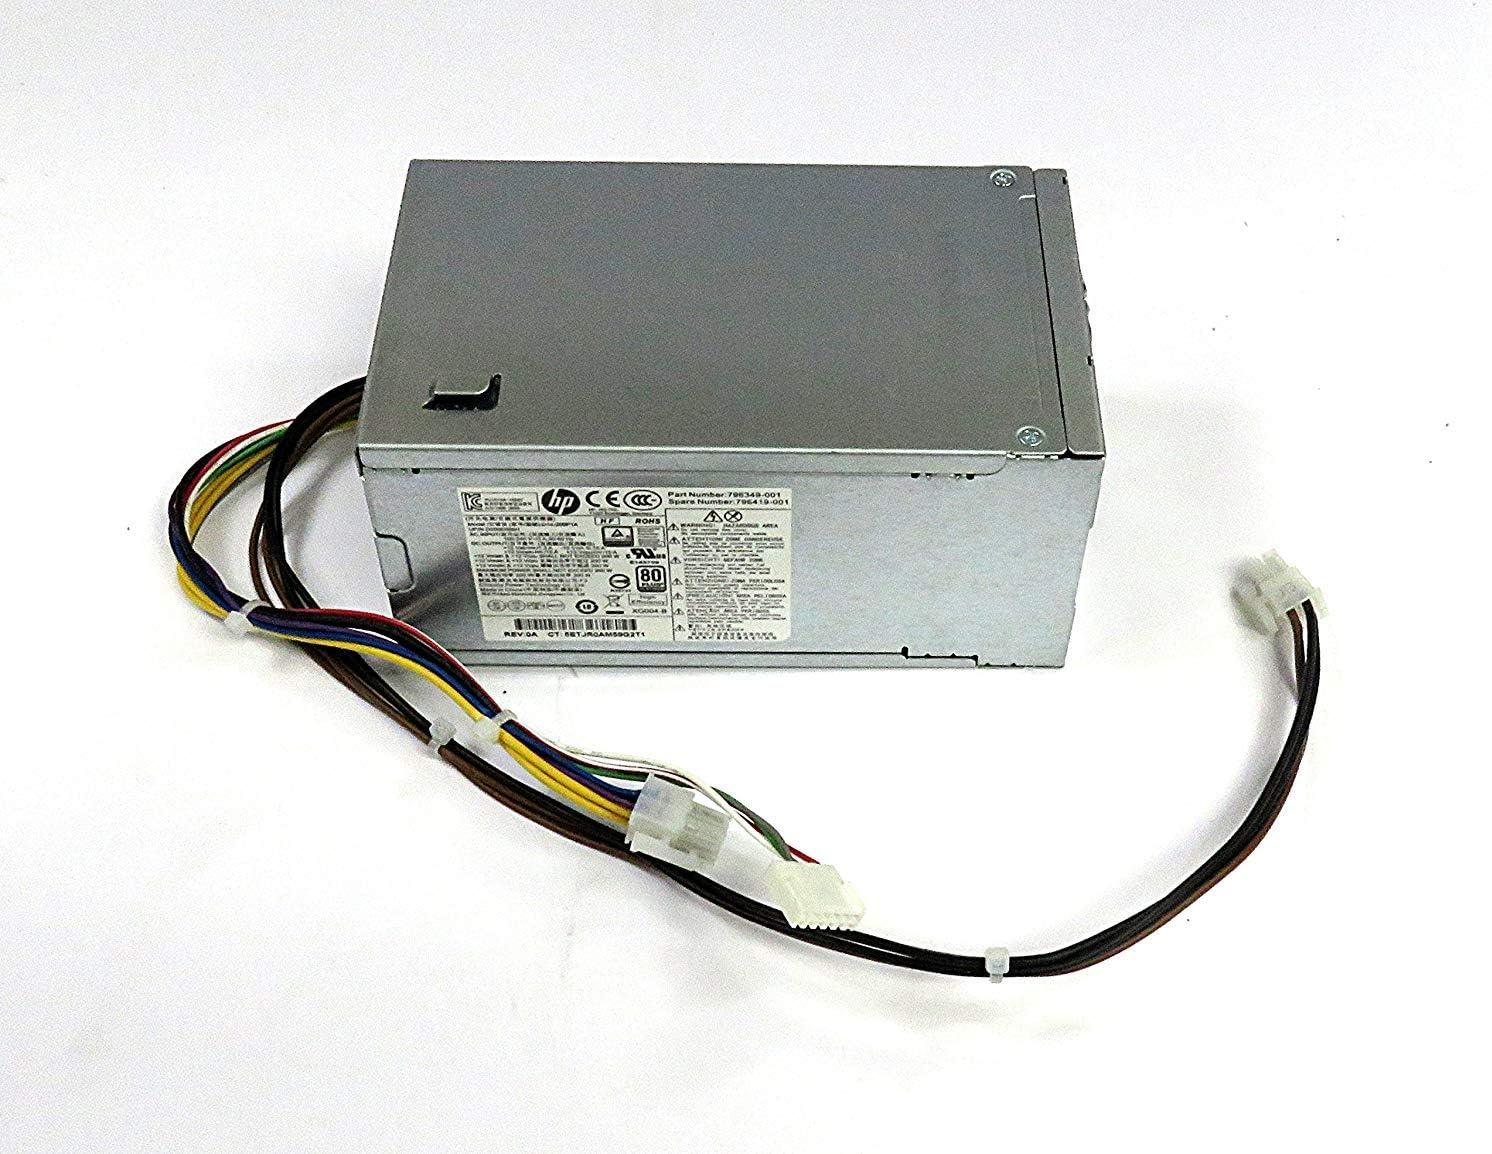 Platinum Power Supply 901912-002 New Genuine PS for HP EliteDesk Prodesk 600 705 800 SFF G2 200W 80